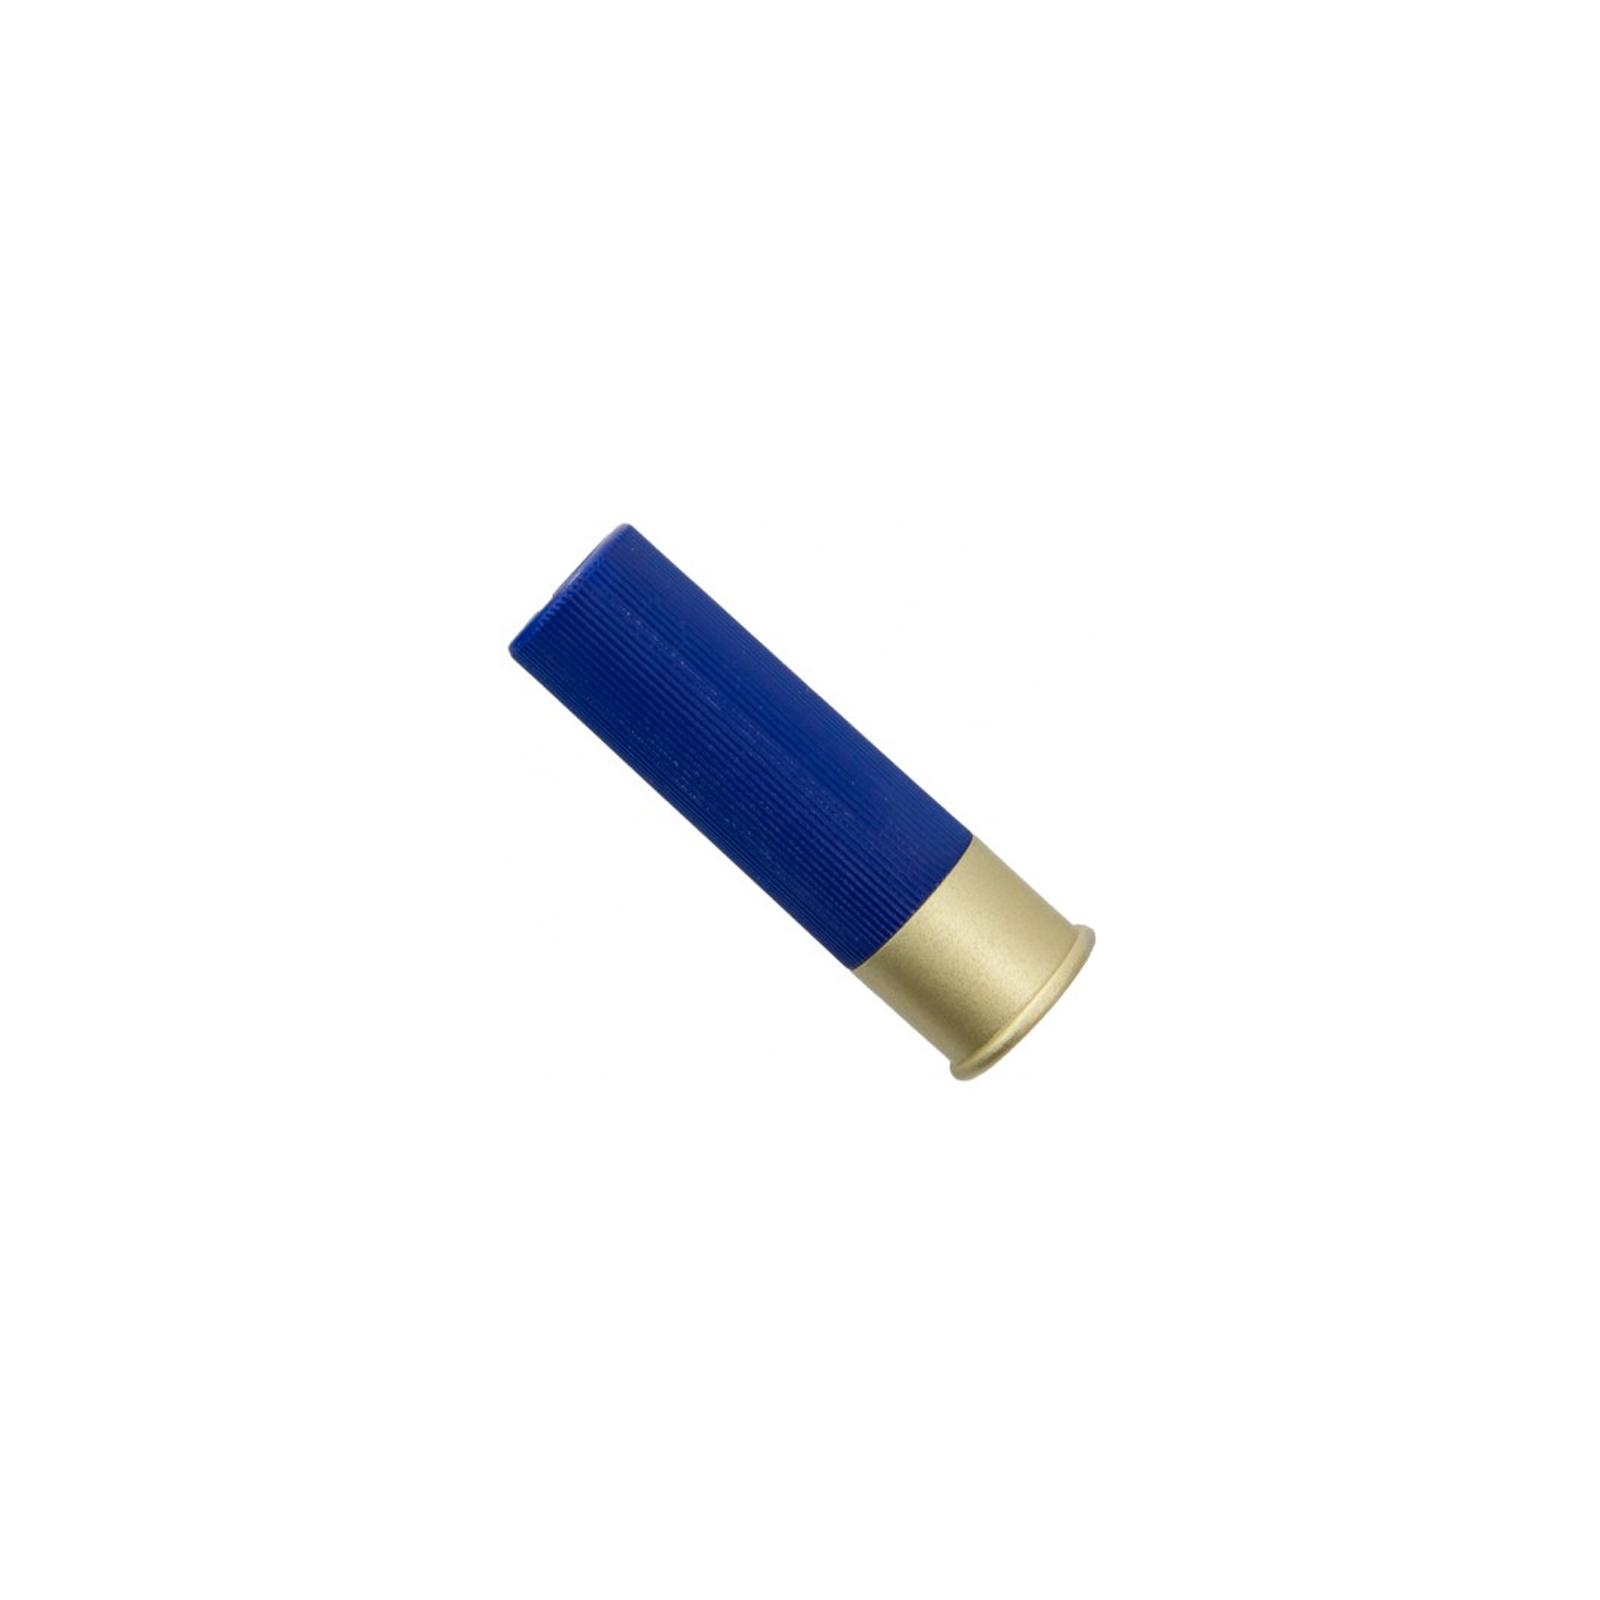 Нож Ganzo G624 синий (G624M-BL/G624S-BL) изображение 3